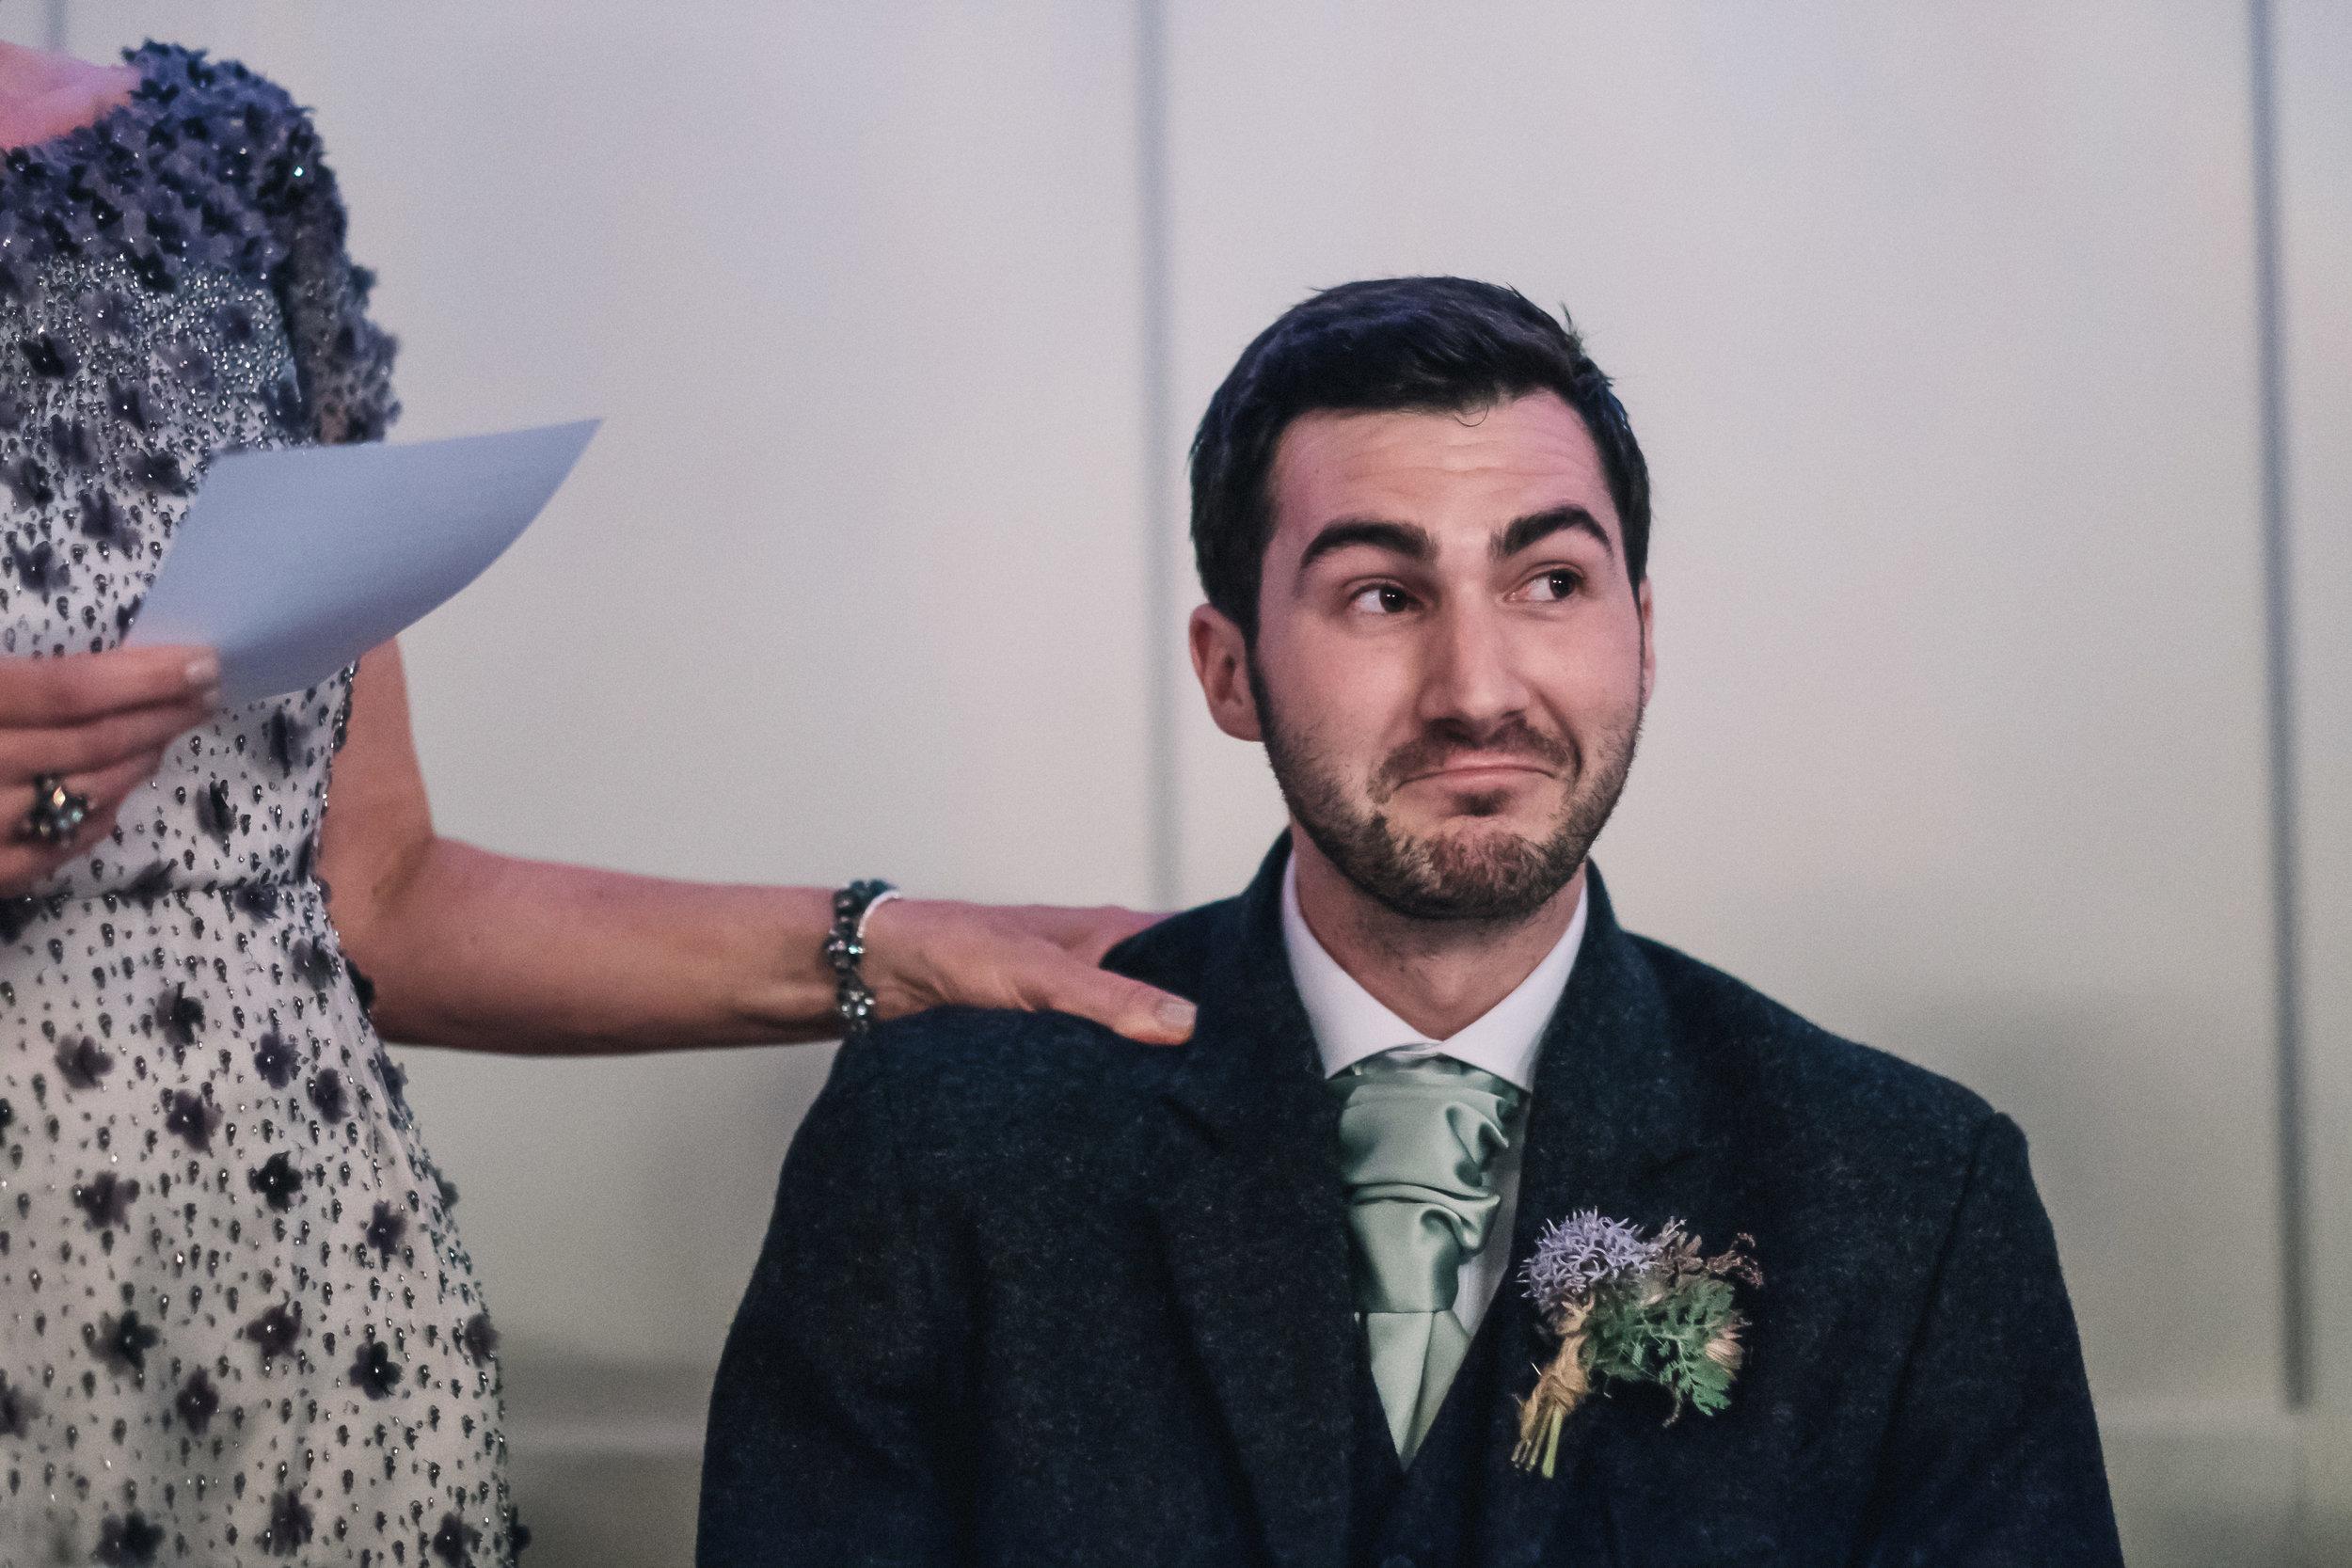 Mother of the bride's speech